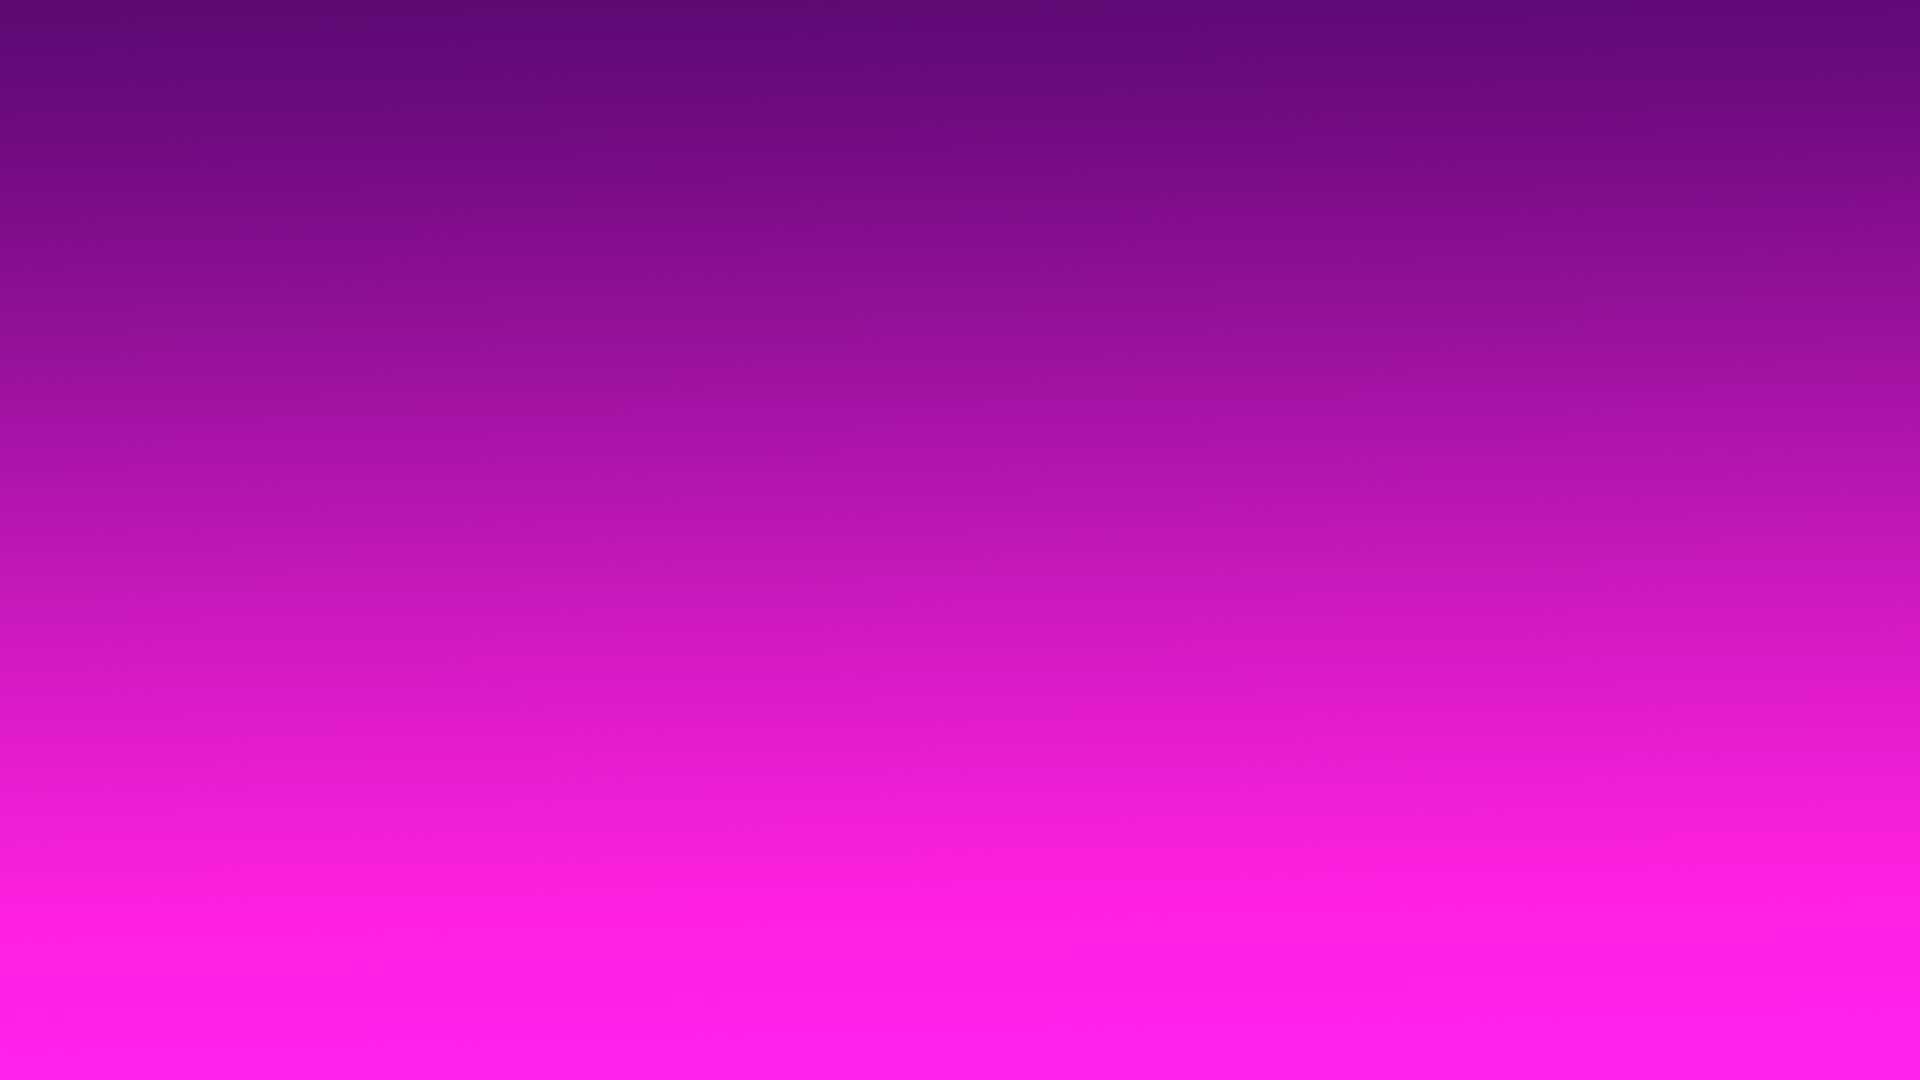 66+] Purple Pink Background On WallpaperSafari